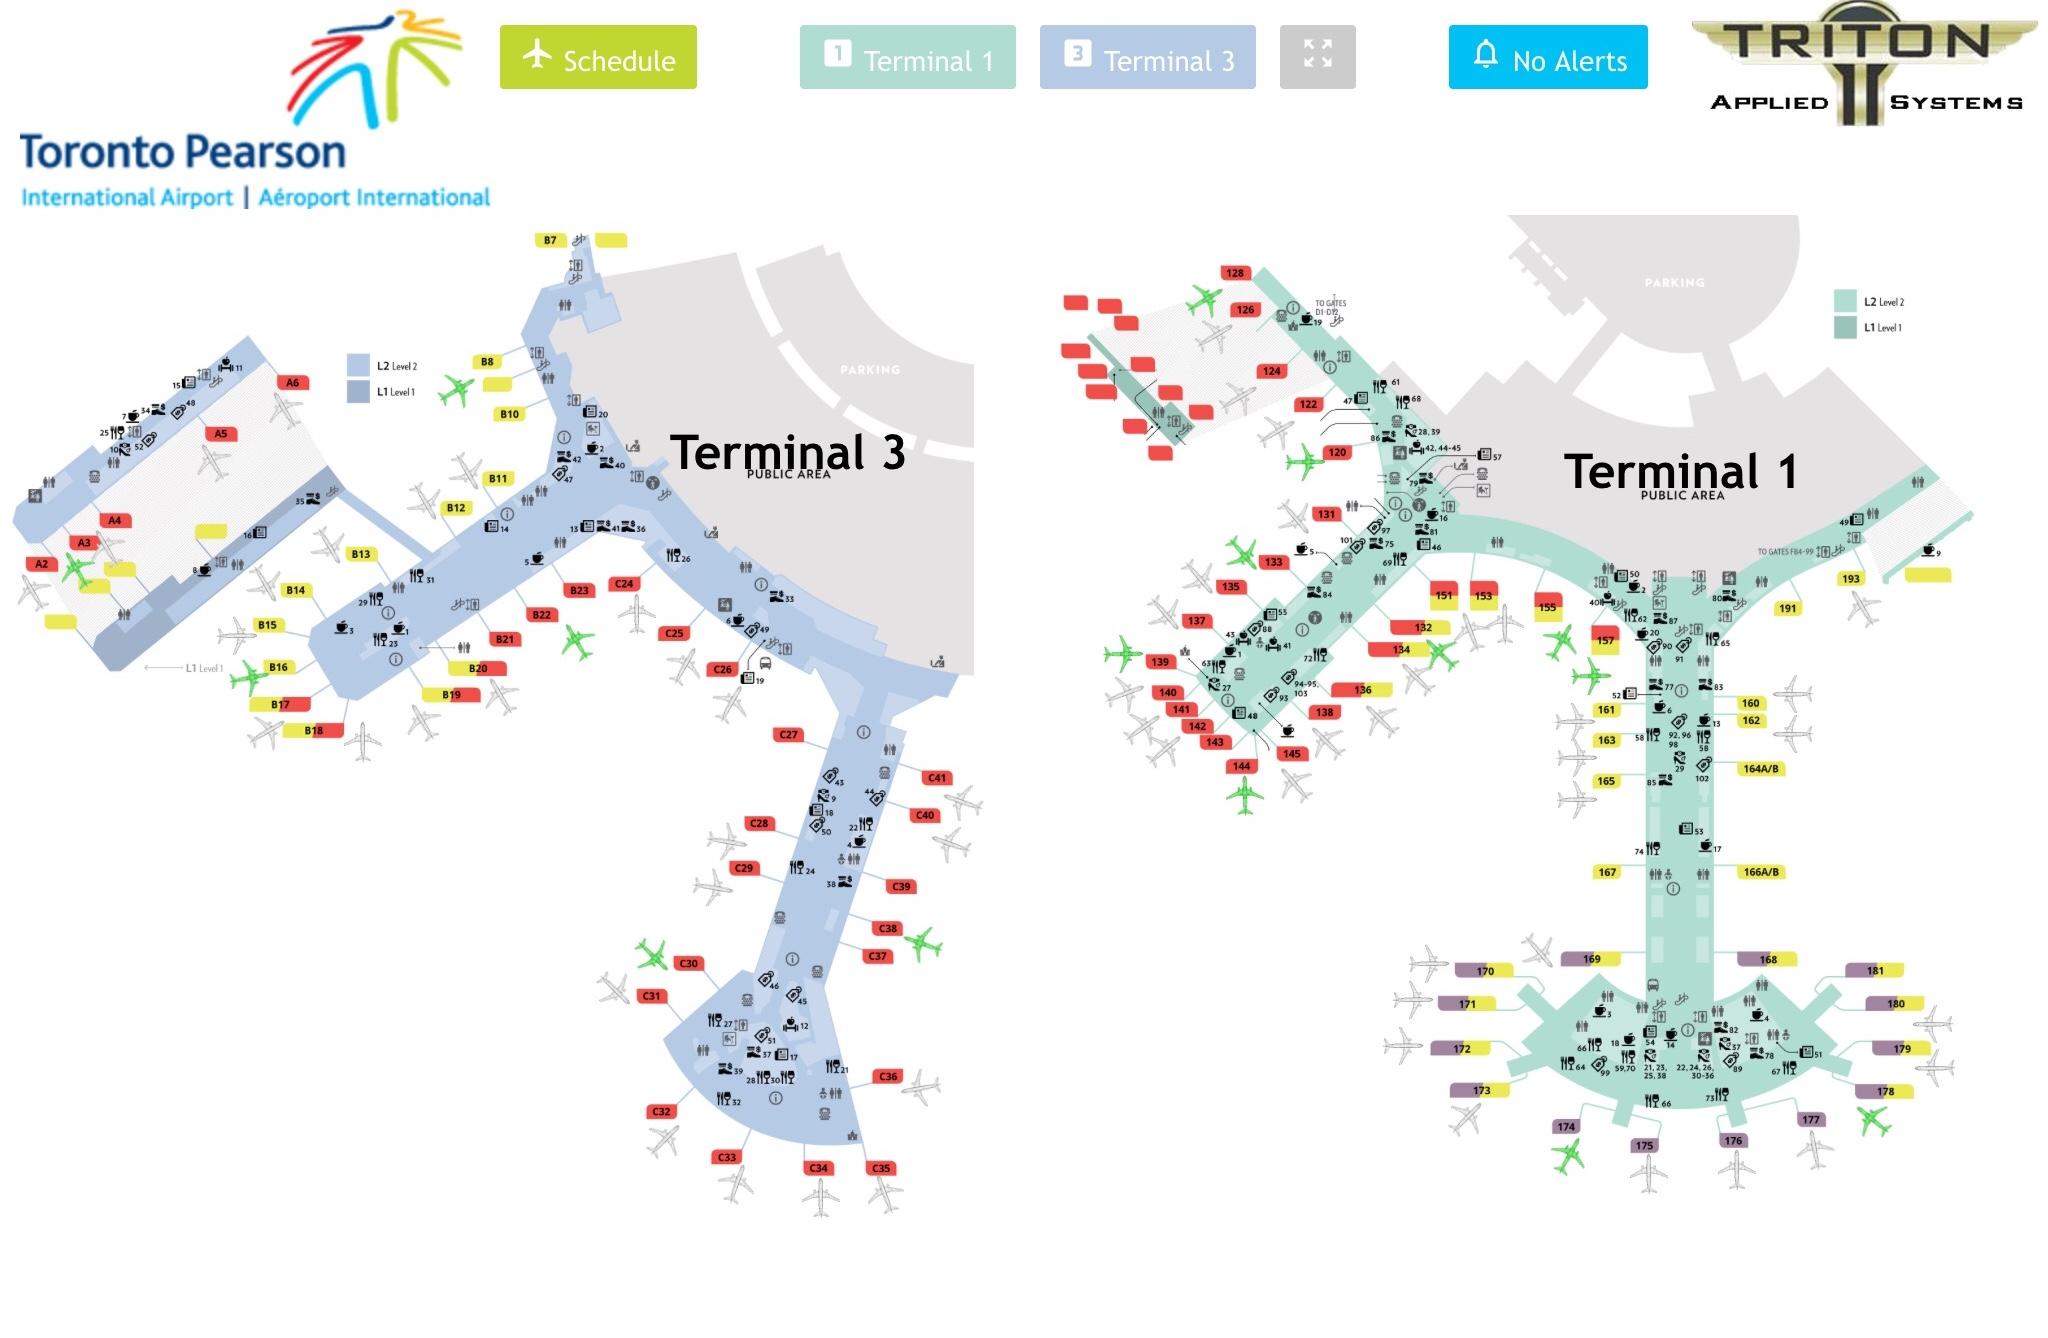 Triton Airport Systems